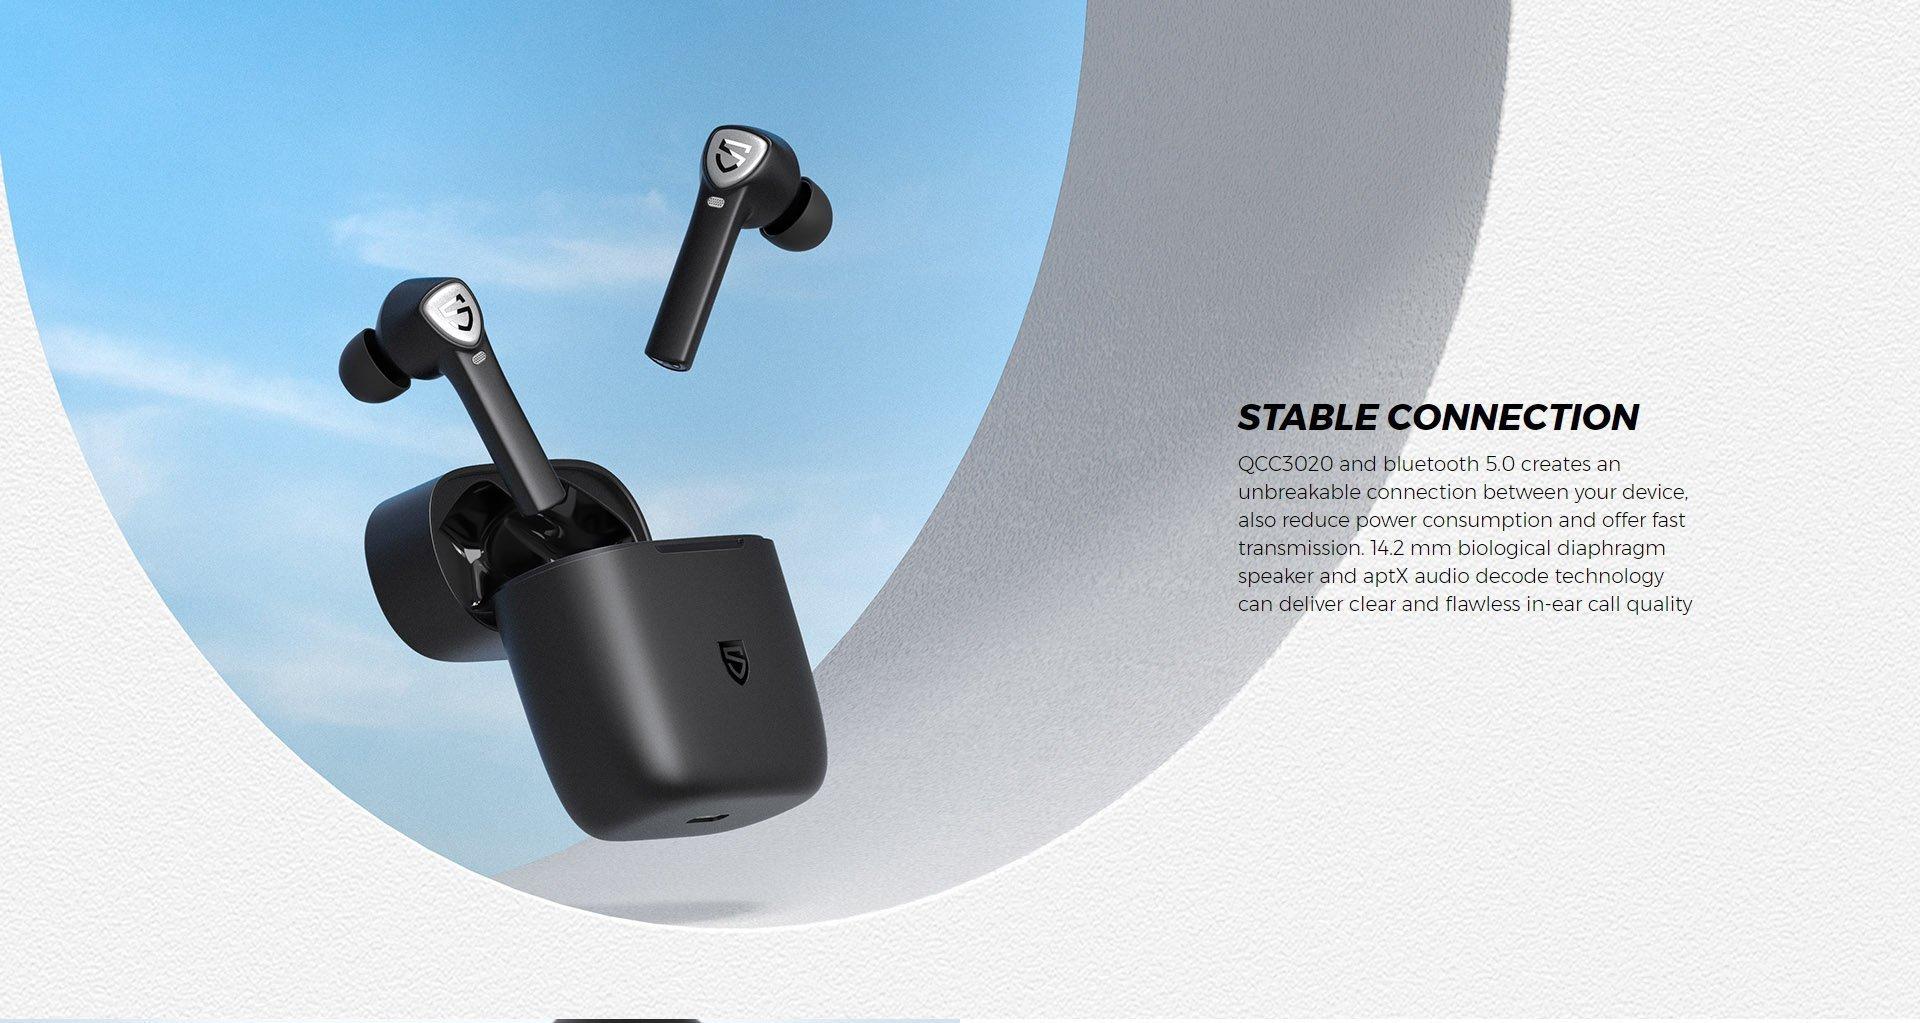 soundpeats true capsule 2 wireless earbuds 4